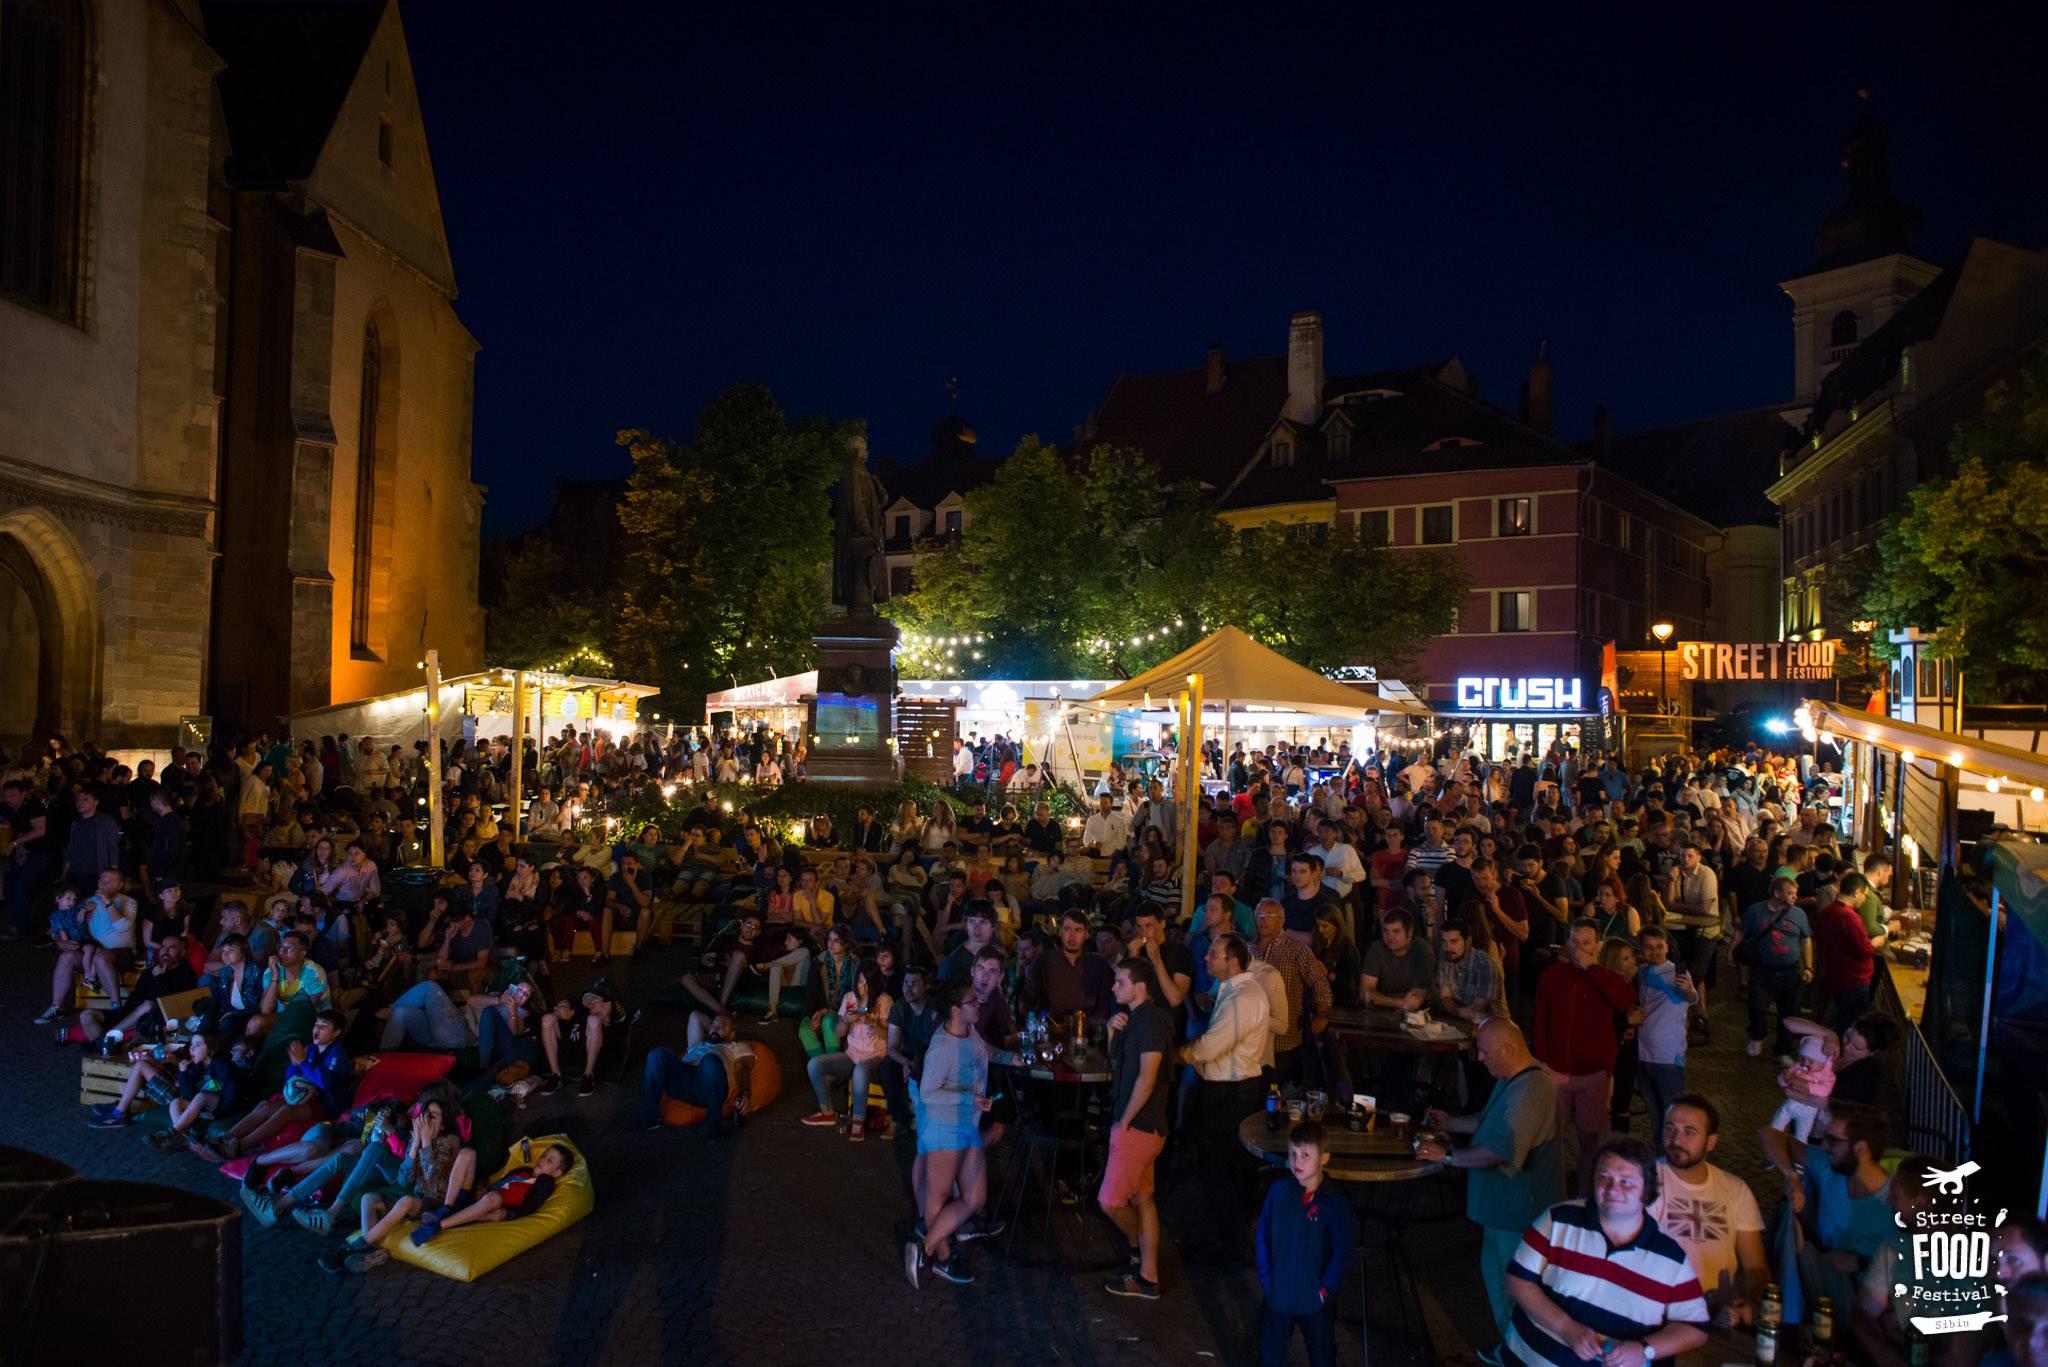 street-food-festival-2017-10.jpg